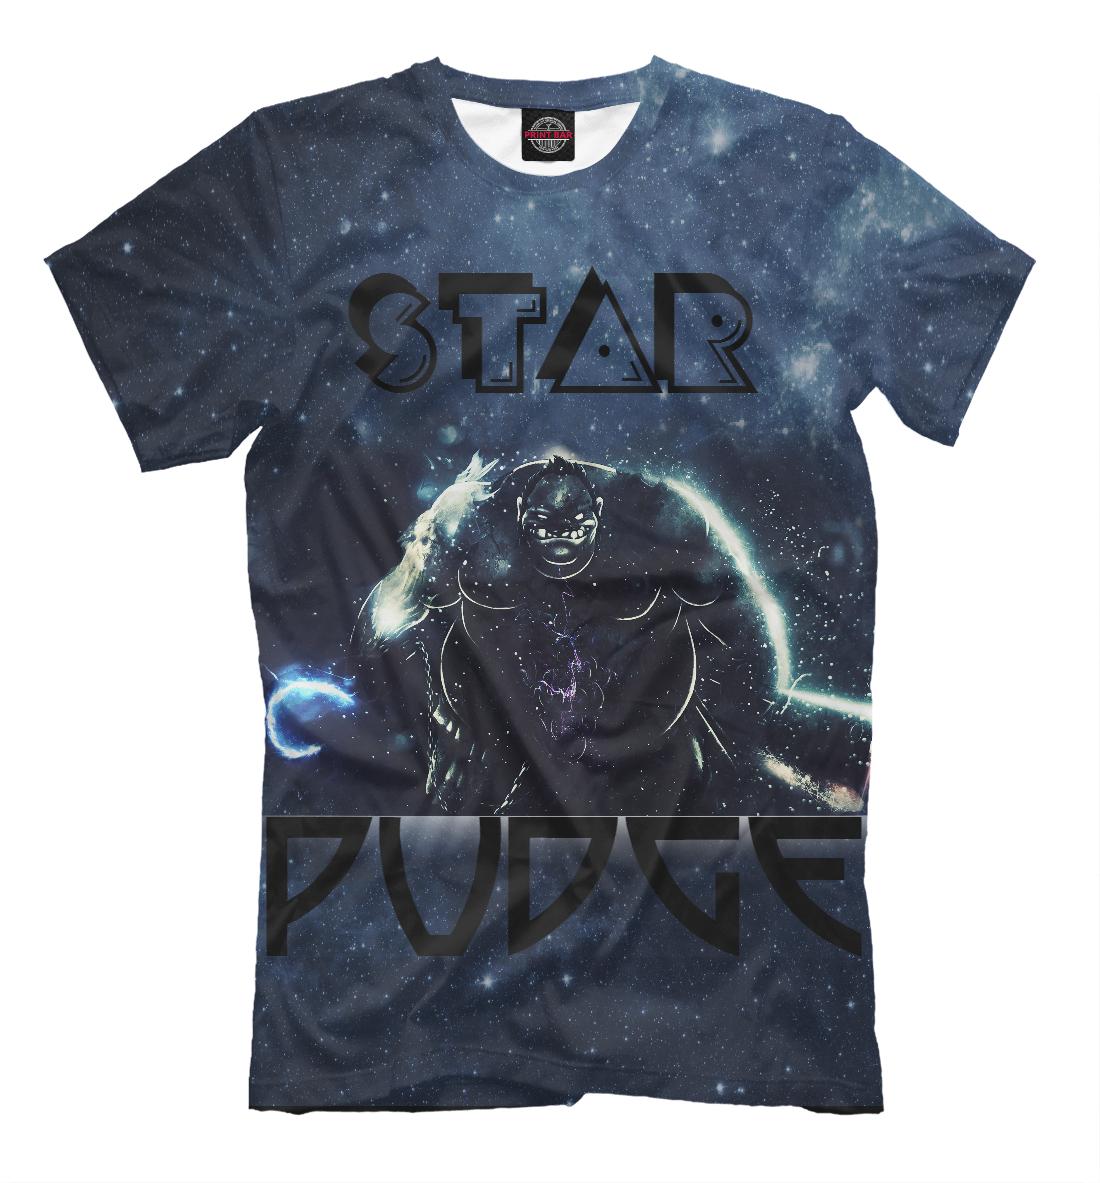 Купить Звёздный Пудж (Star Pudge), Printbar, Футболки, DO2-935955-fut-2